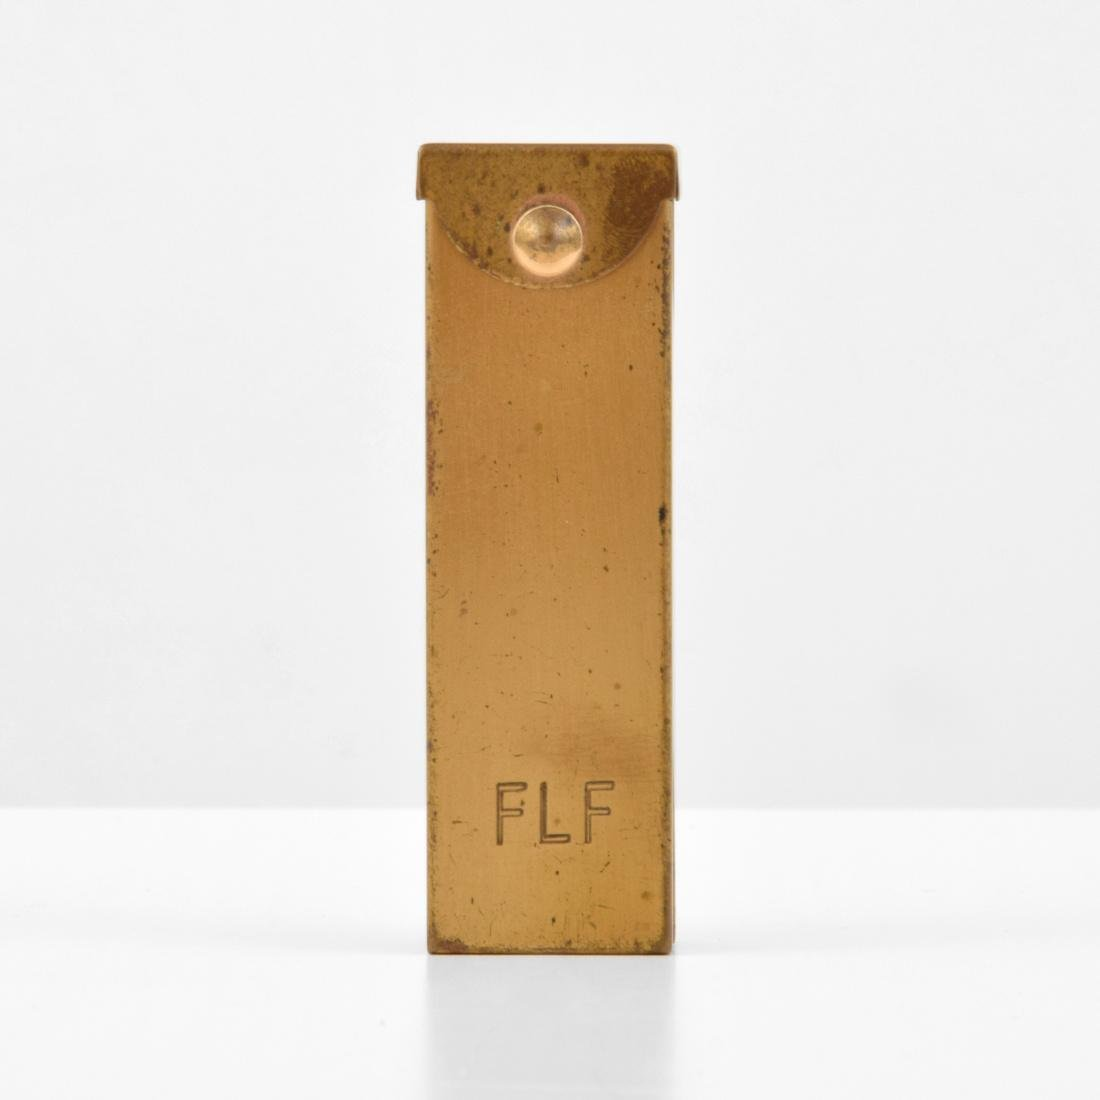 Farrah Fawcett Personal Monogrammed Lipstick Holder - 3